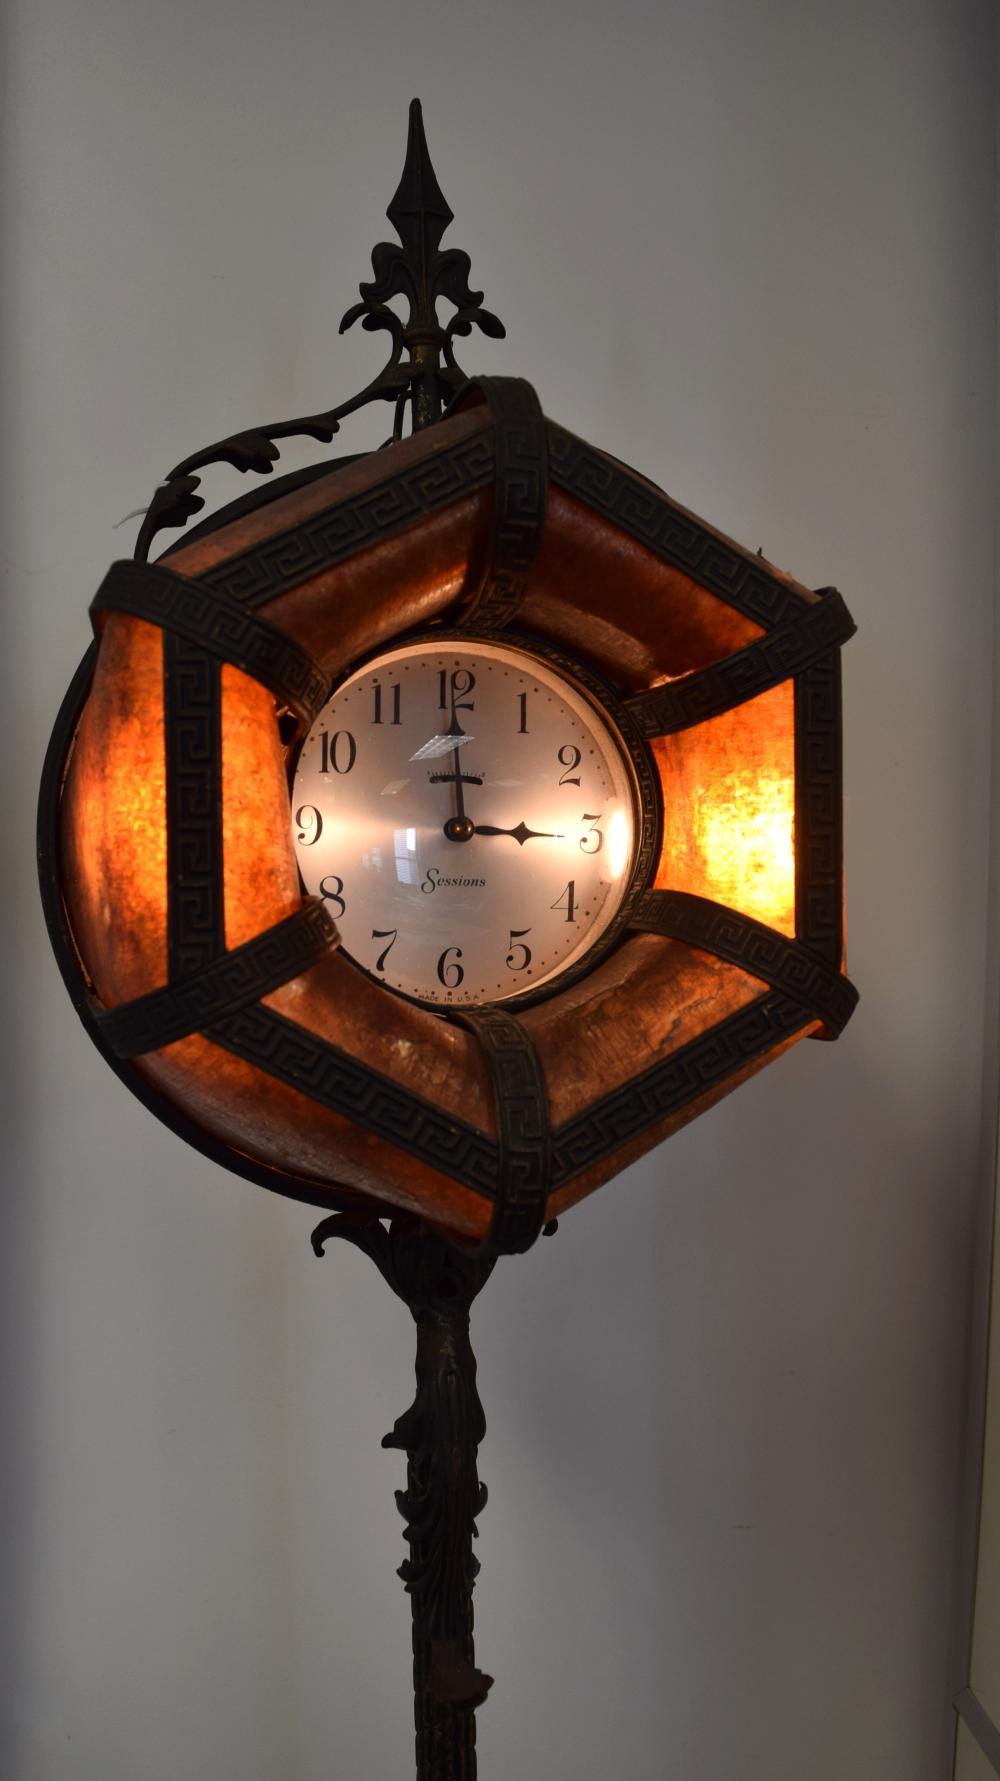 SESSIONS ARTS & CRAFTS MICA SHADE FLOOR LAMP & CLOCK: